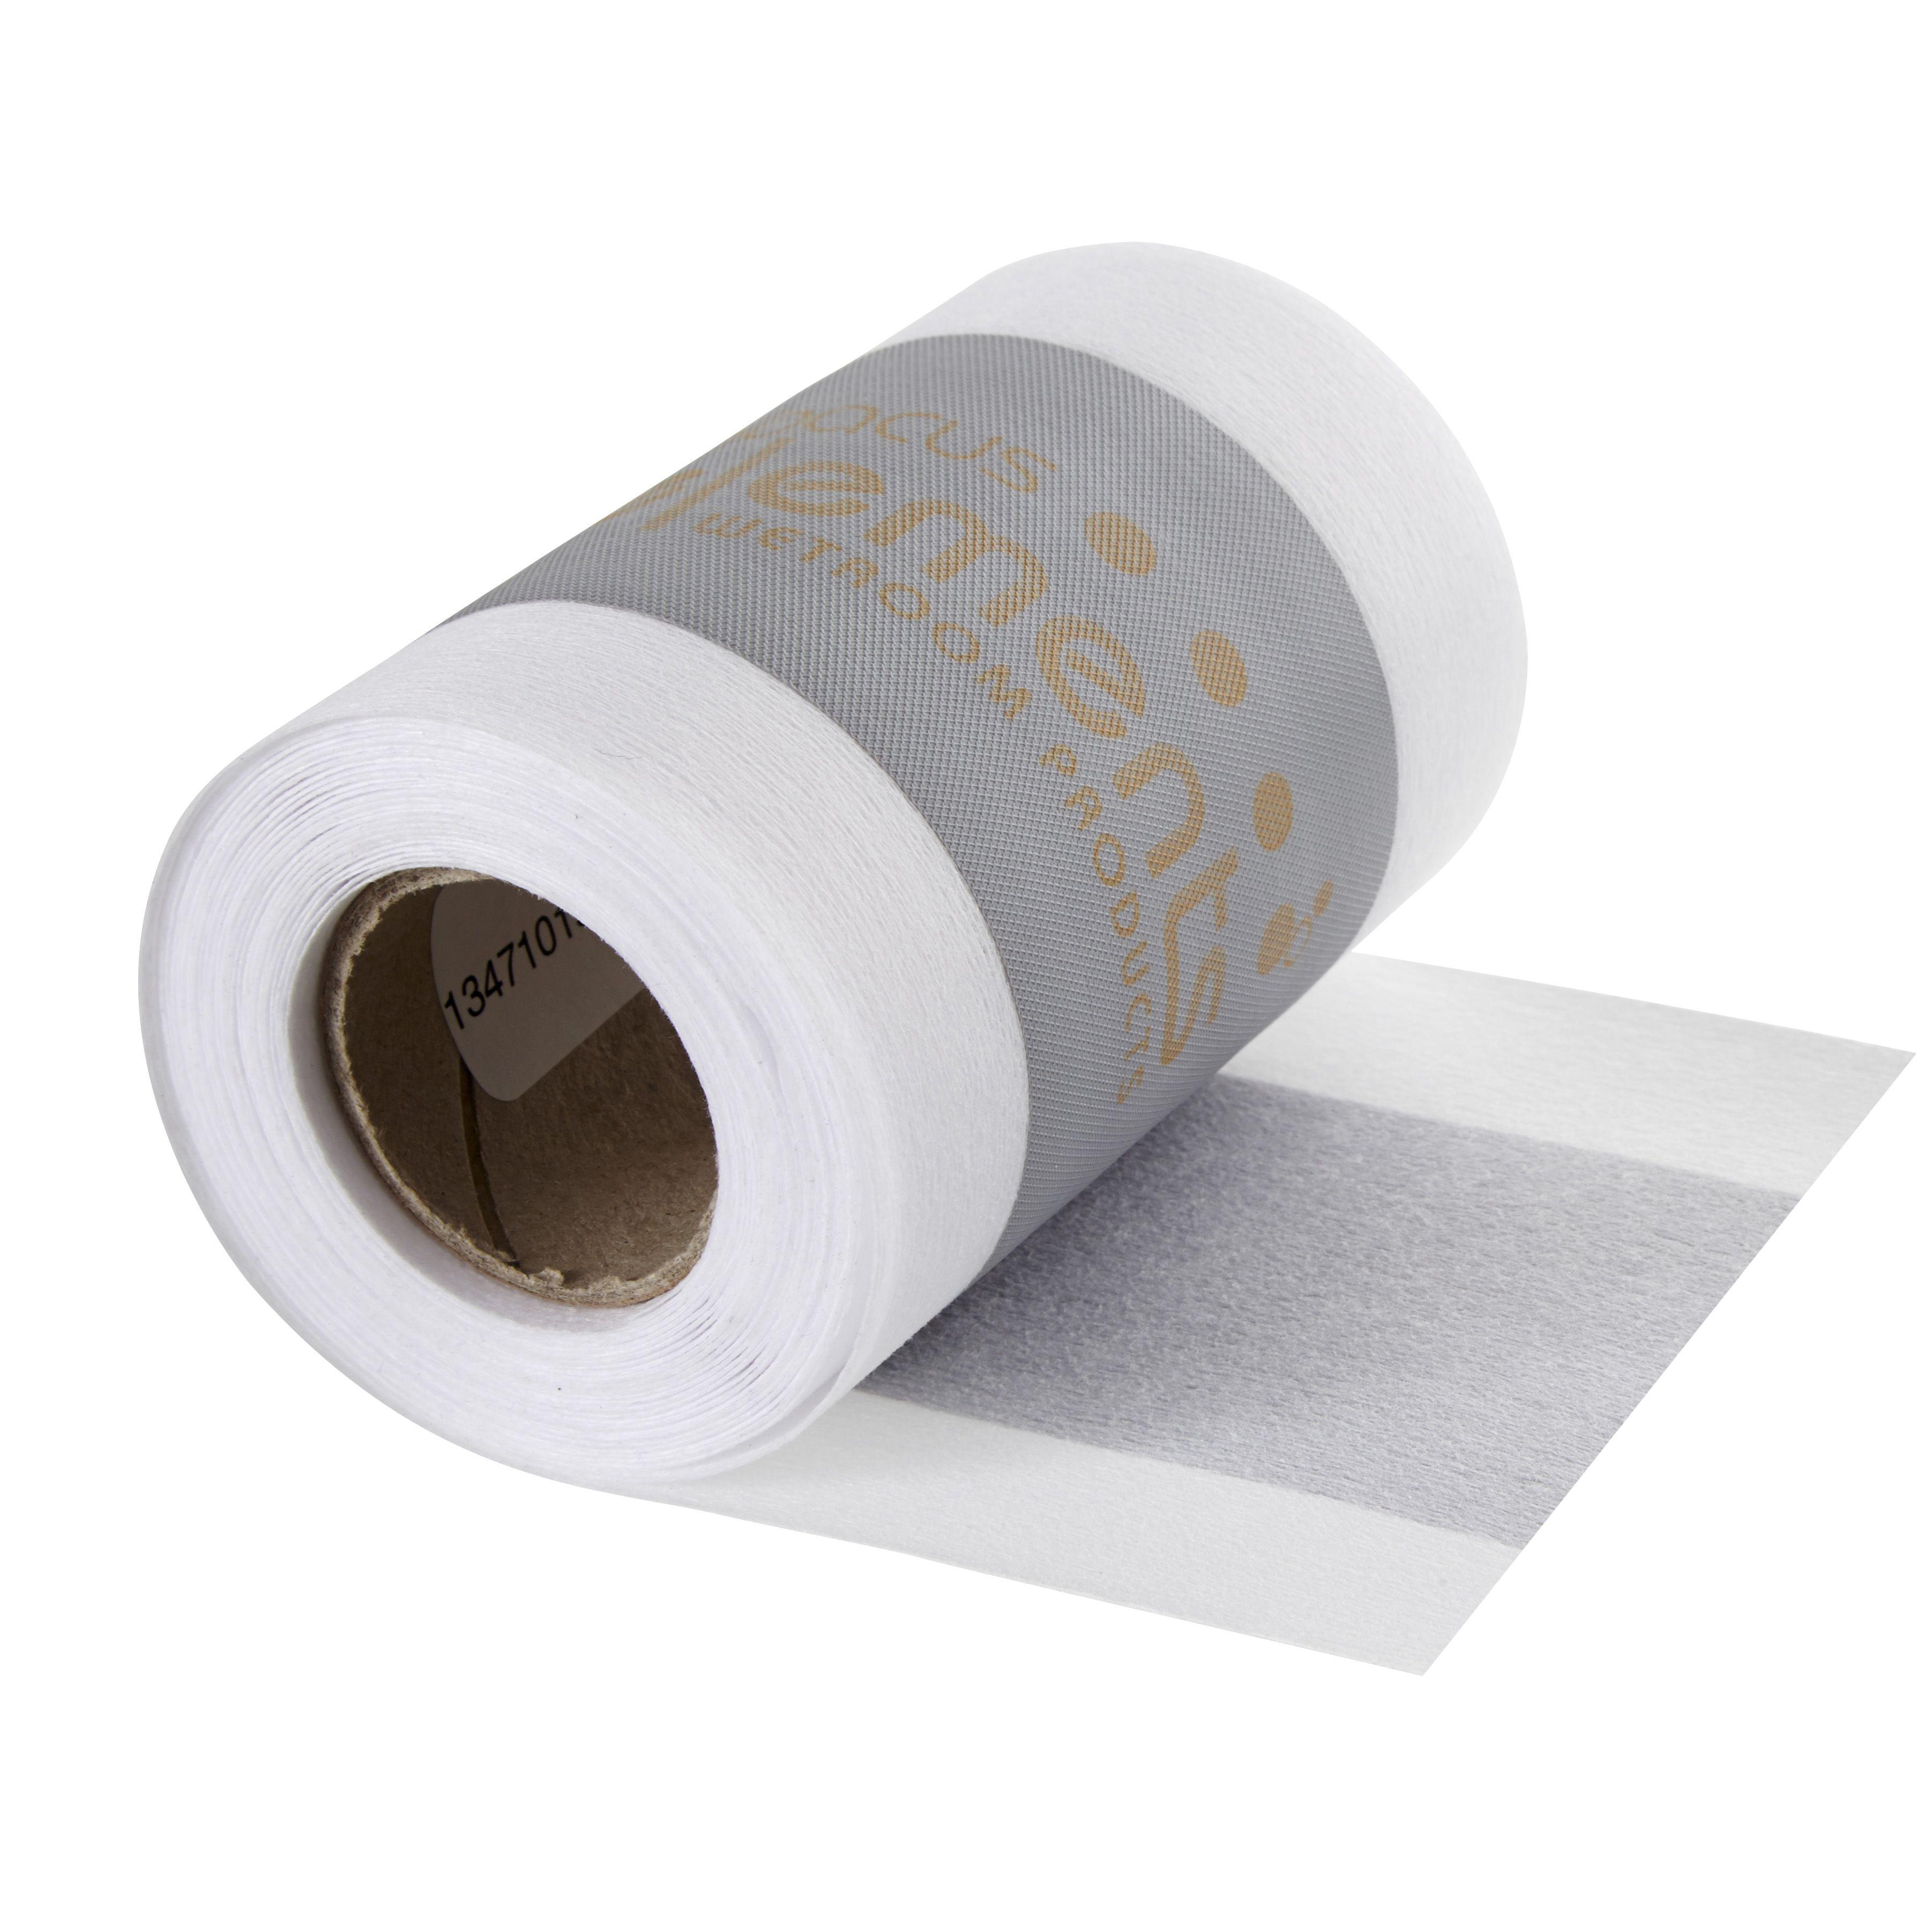 Aquadry Grey Amp White Waterproof Tape L 5m Departments